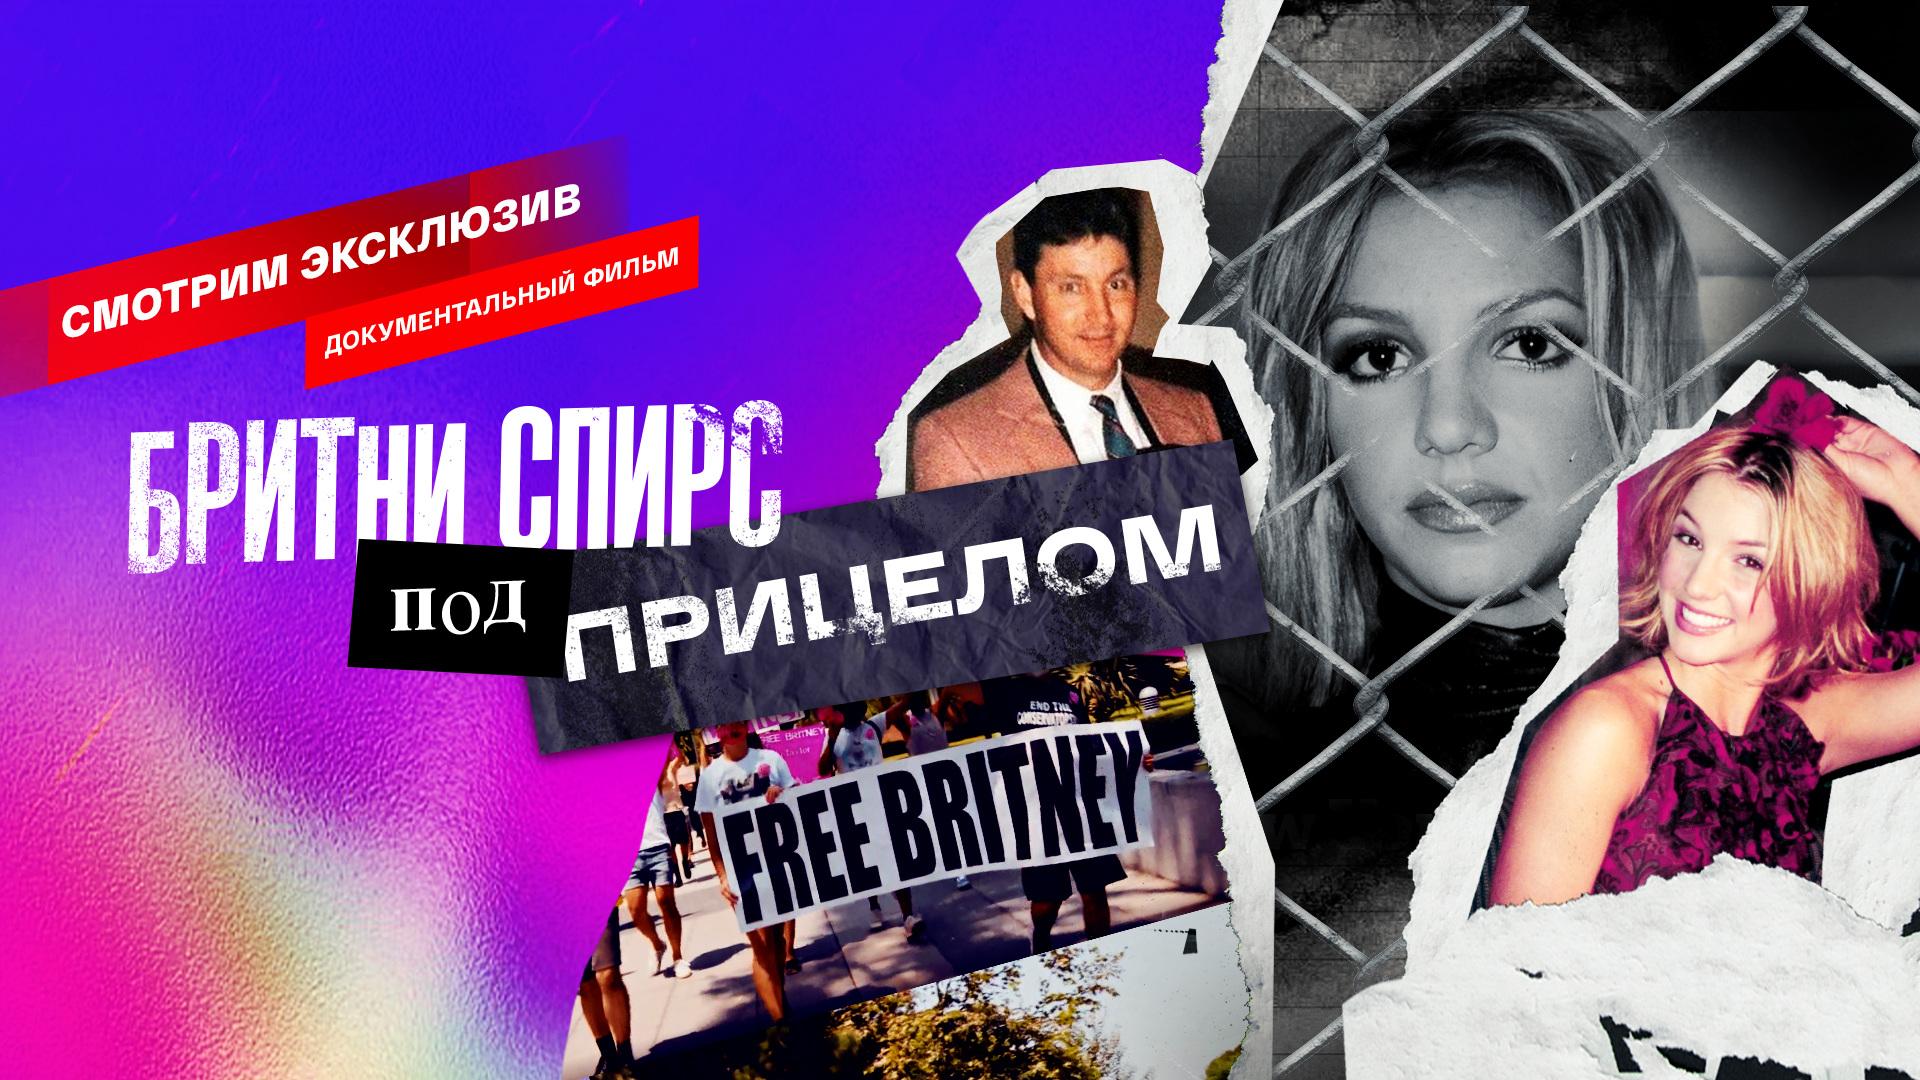 Свободу Бритни